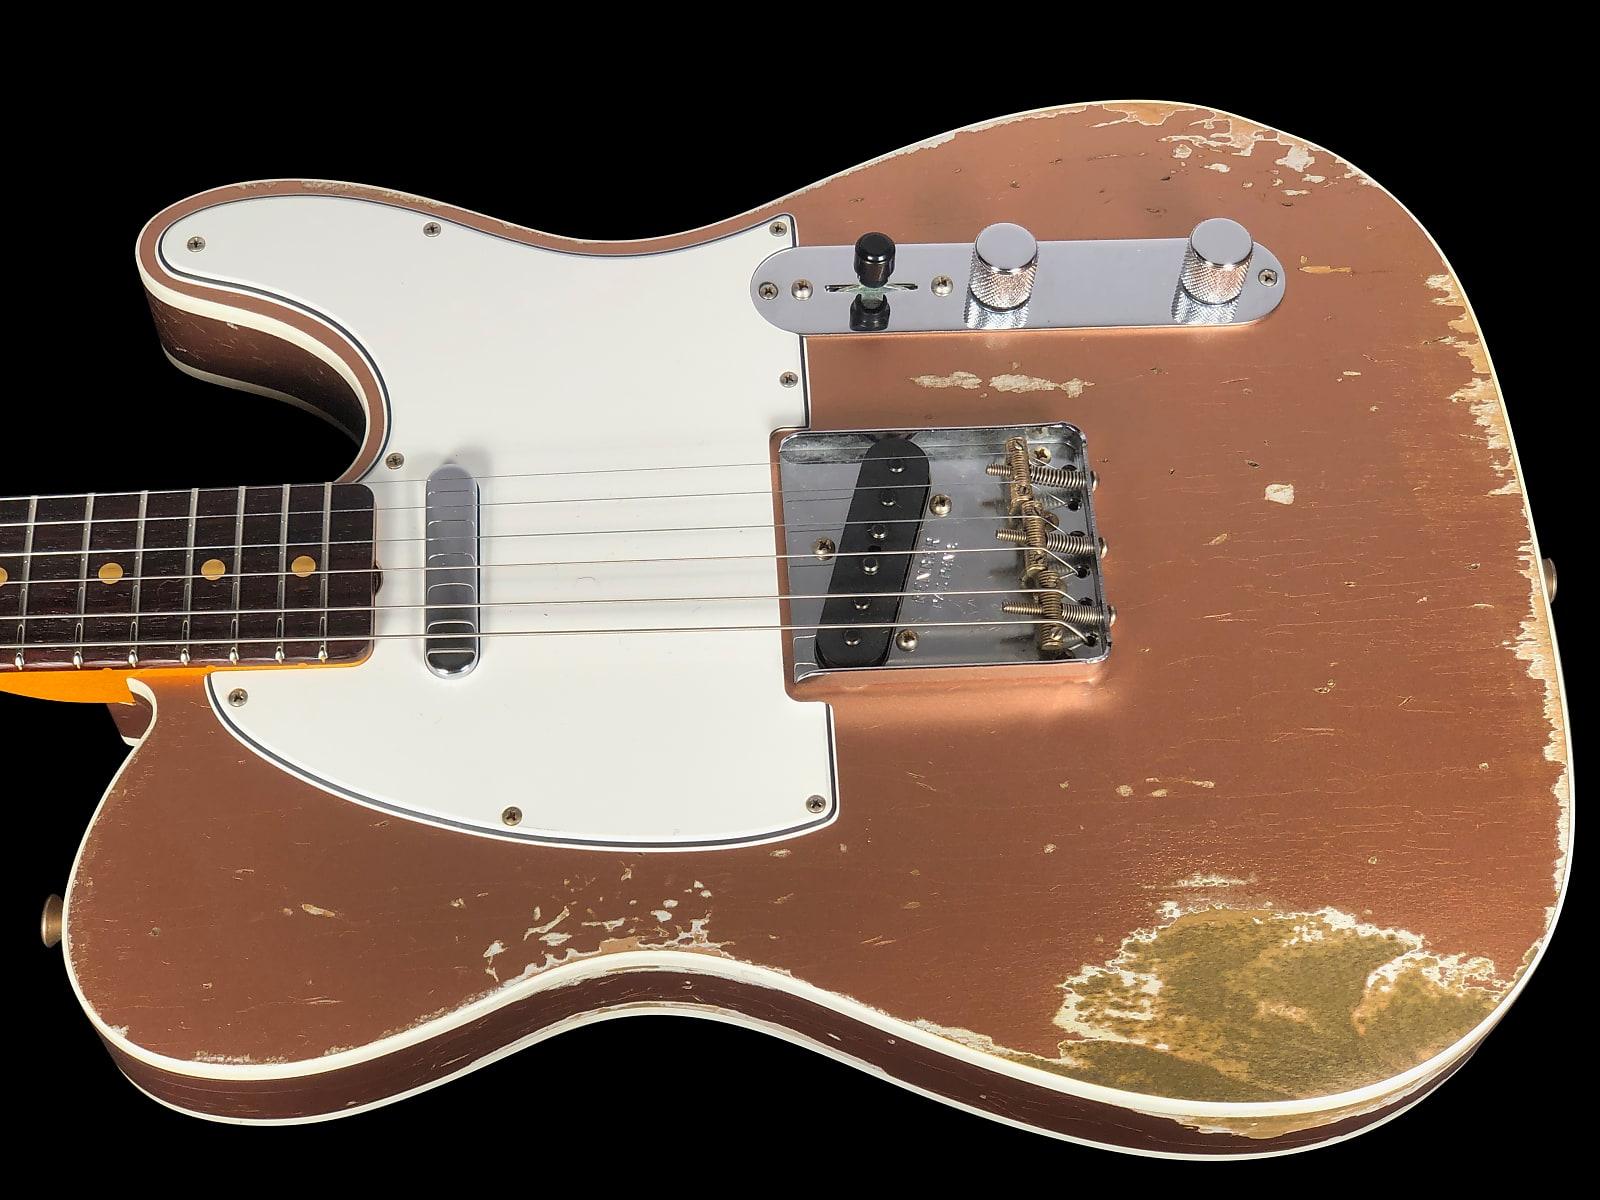 2019 Fender Telecaster 1960 Custom Shop  Heavy Relic 60 Tele ~ Copper